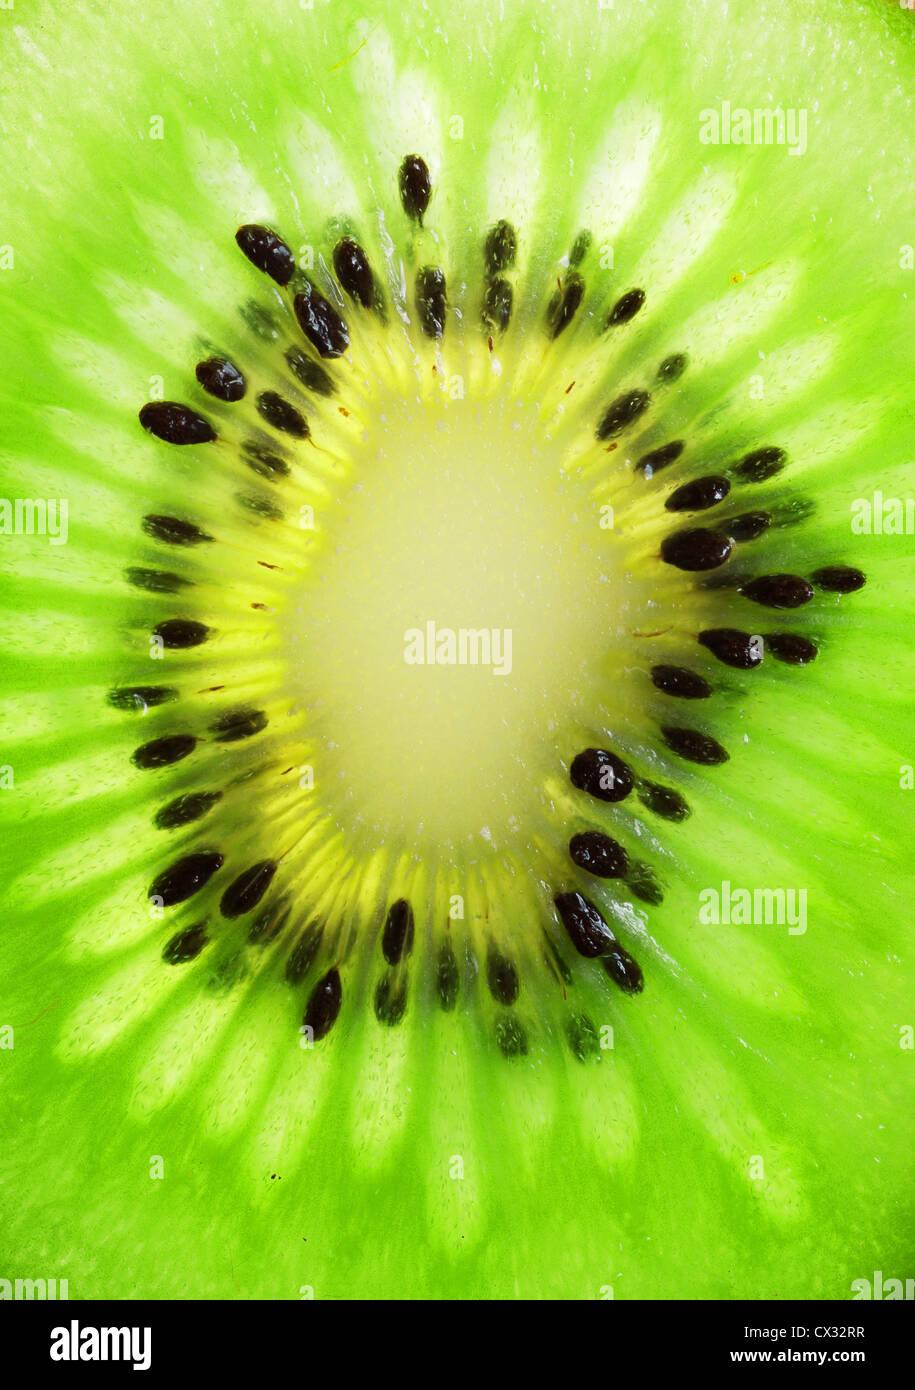 Close up of a slice of kiwi - Stock Image